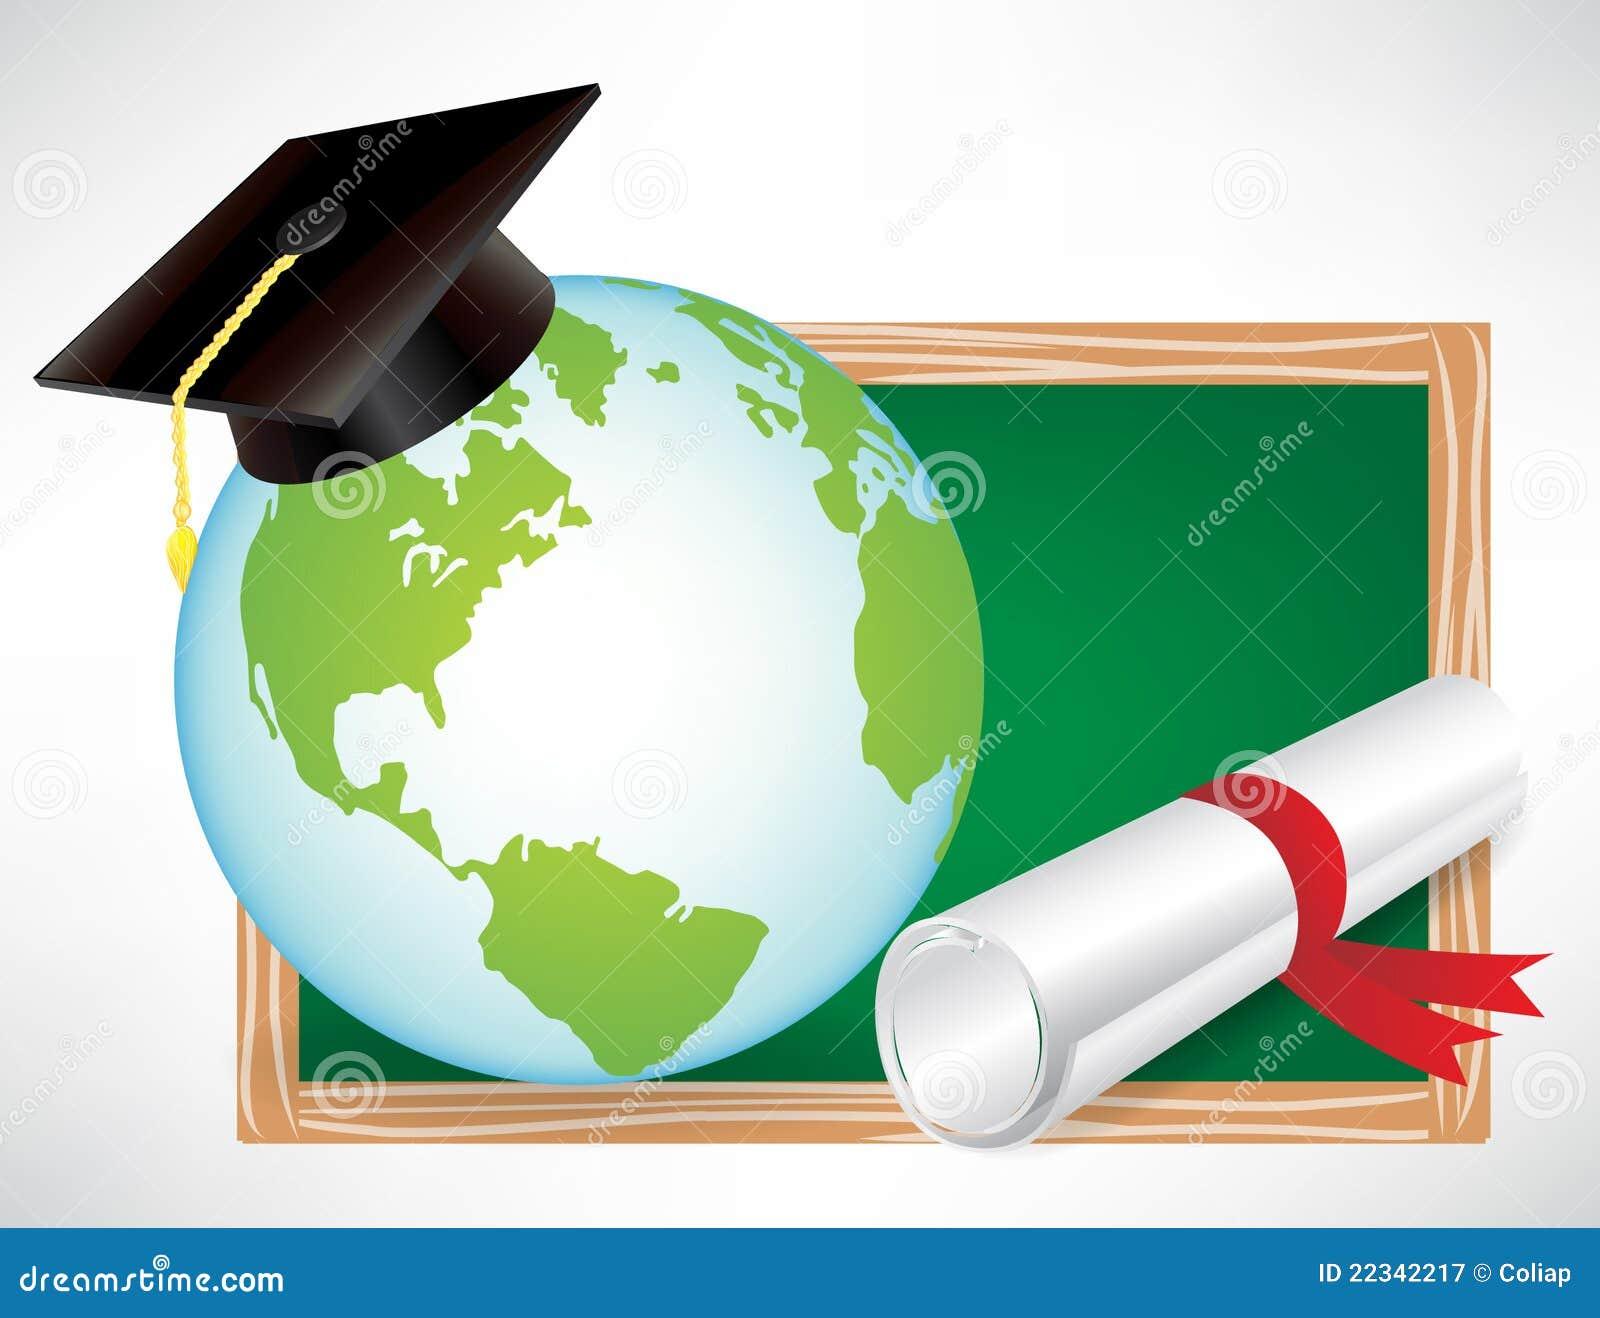 Earth Globe Education Diploma And Cap Royalty Free Stock ...